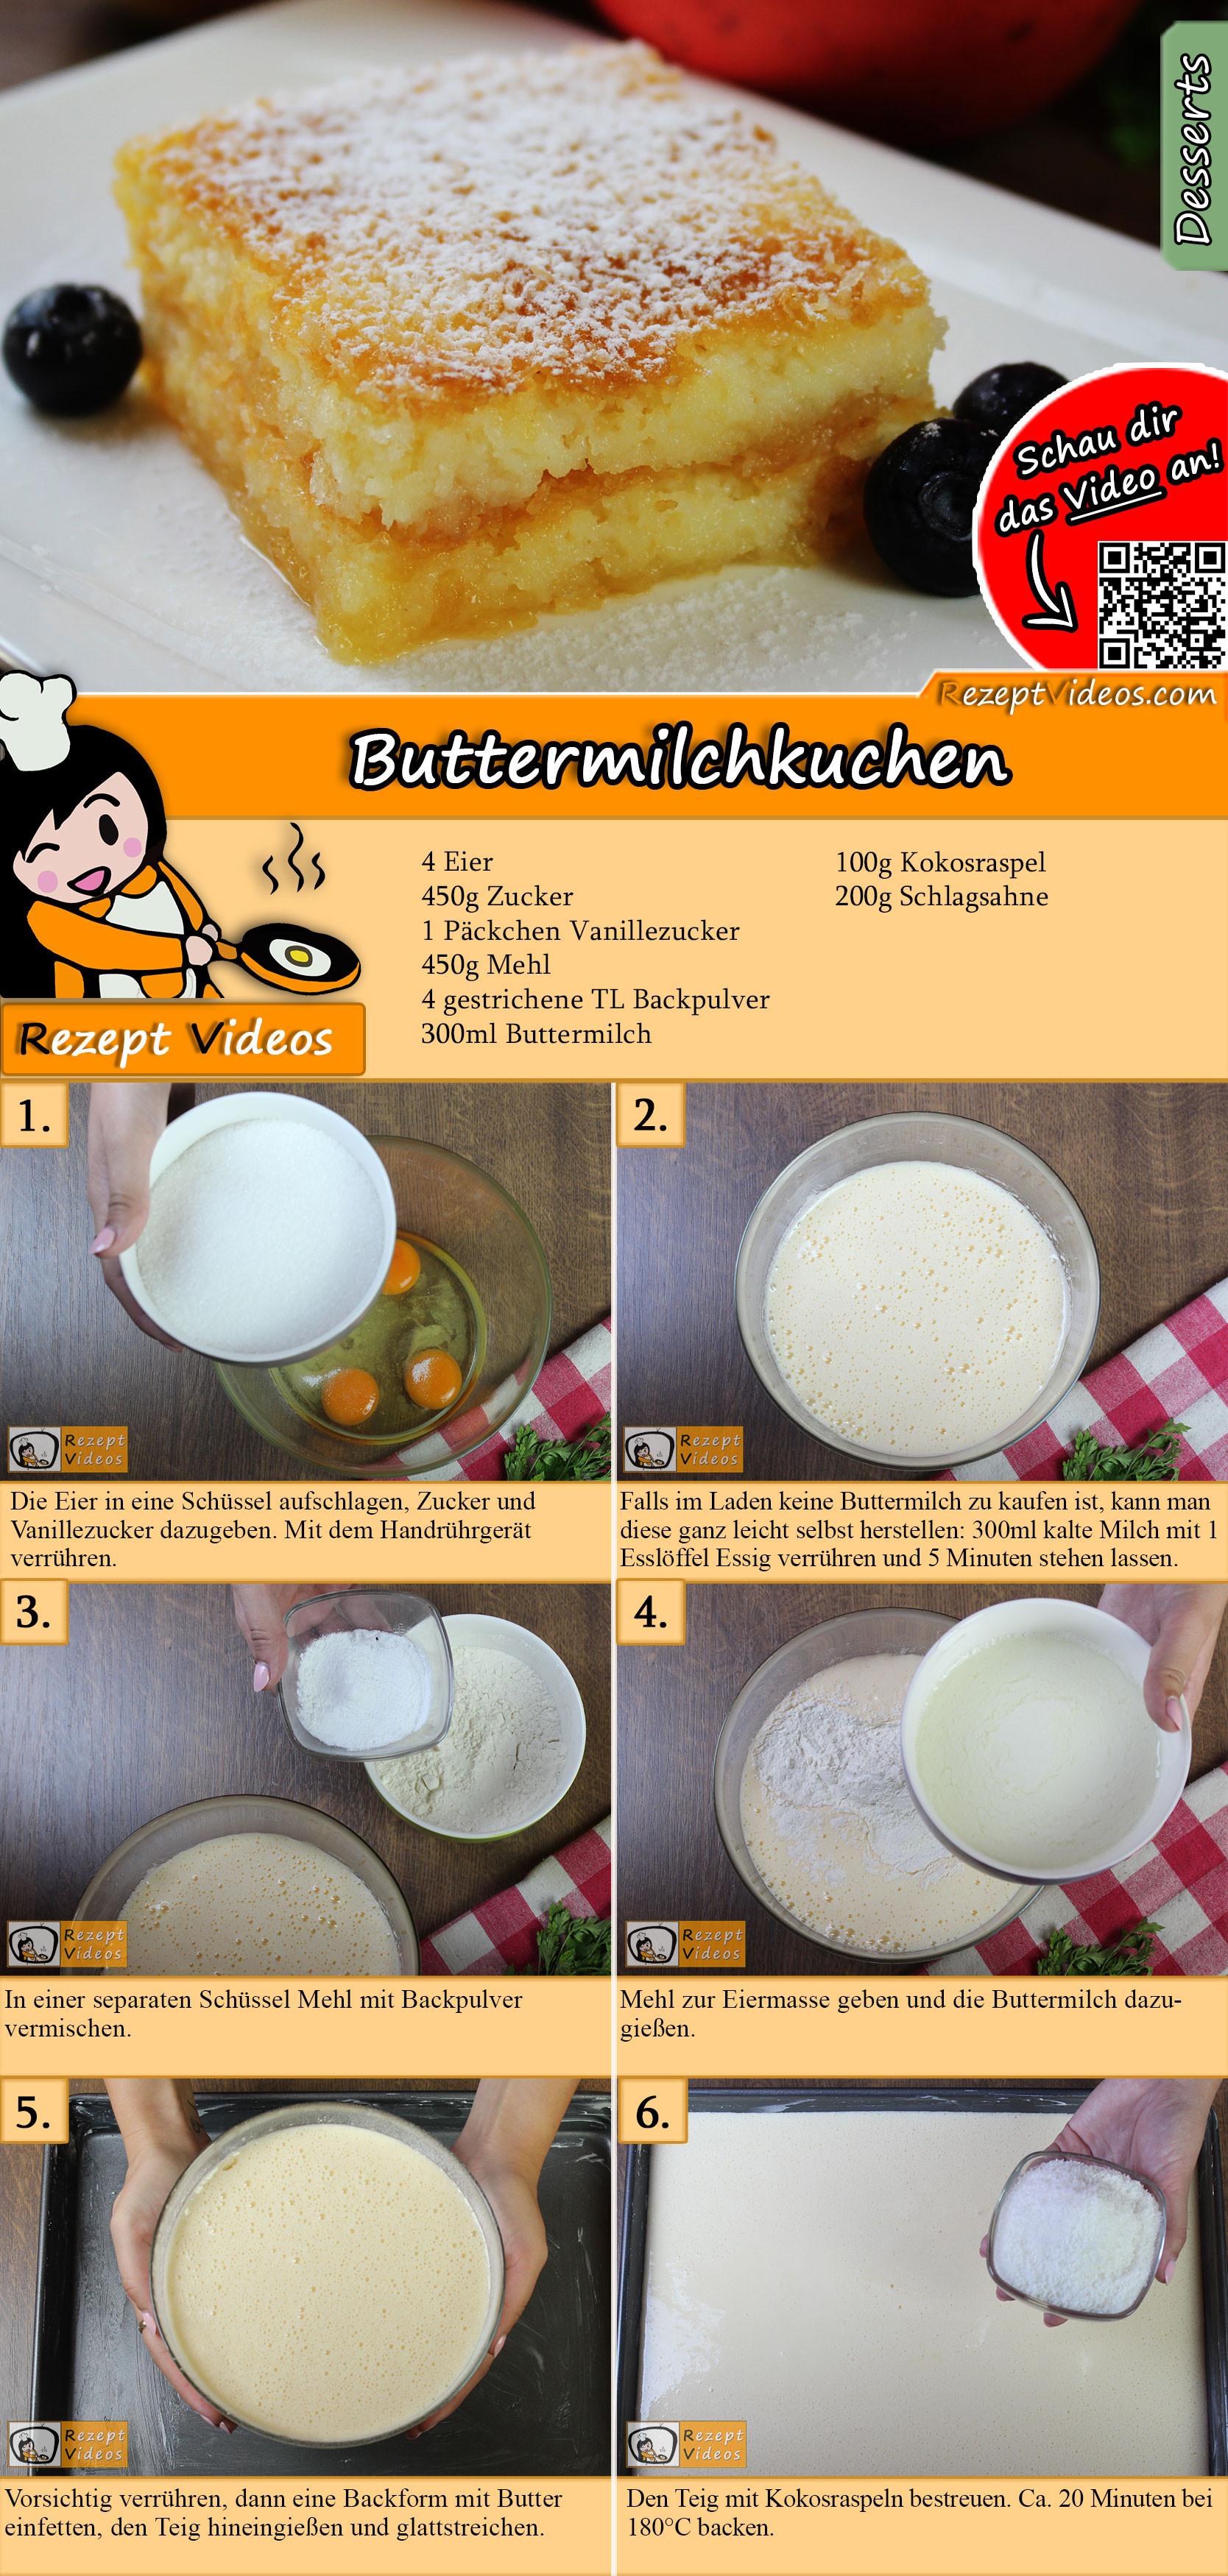 Buttermilchkuchen Rezept mit Video